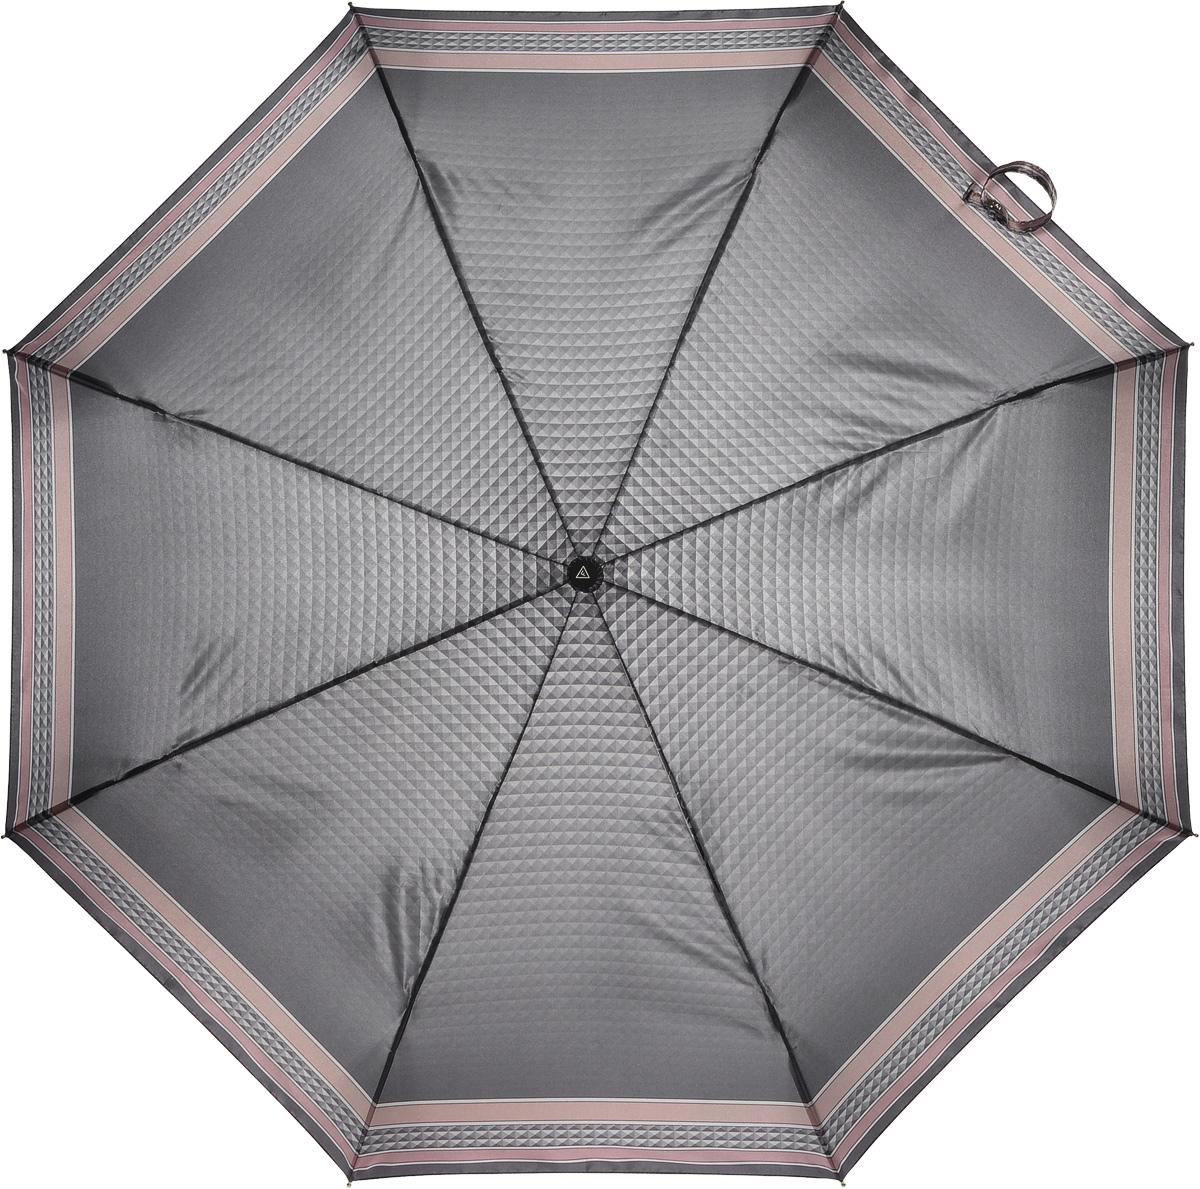 Зонт женский Fabretti, автомат, 3 сложения. L-16104-10L-16104-10Зонт женский Fabretti, облегченный суперавтомат, 3 сложения